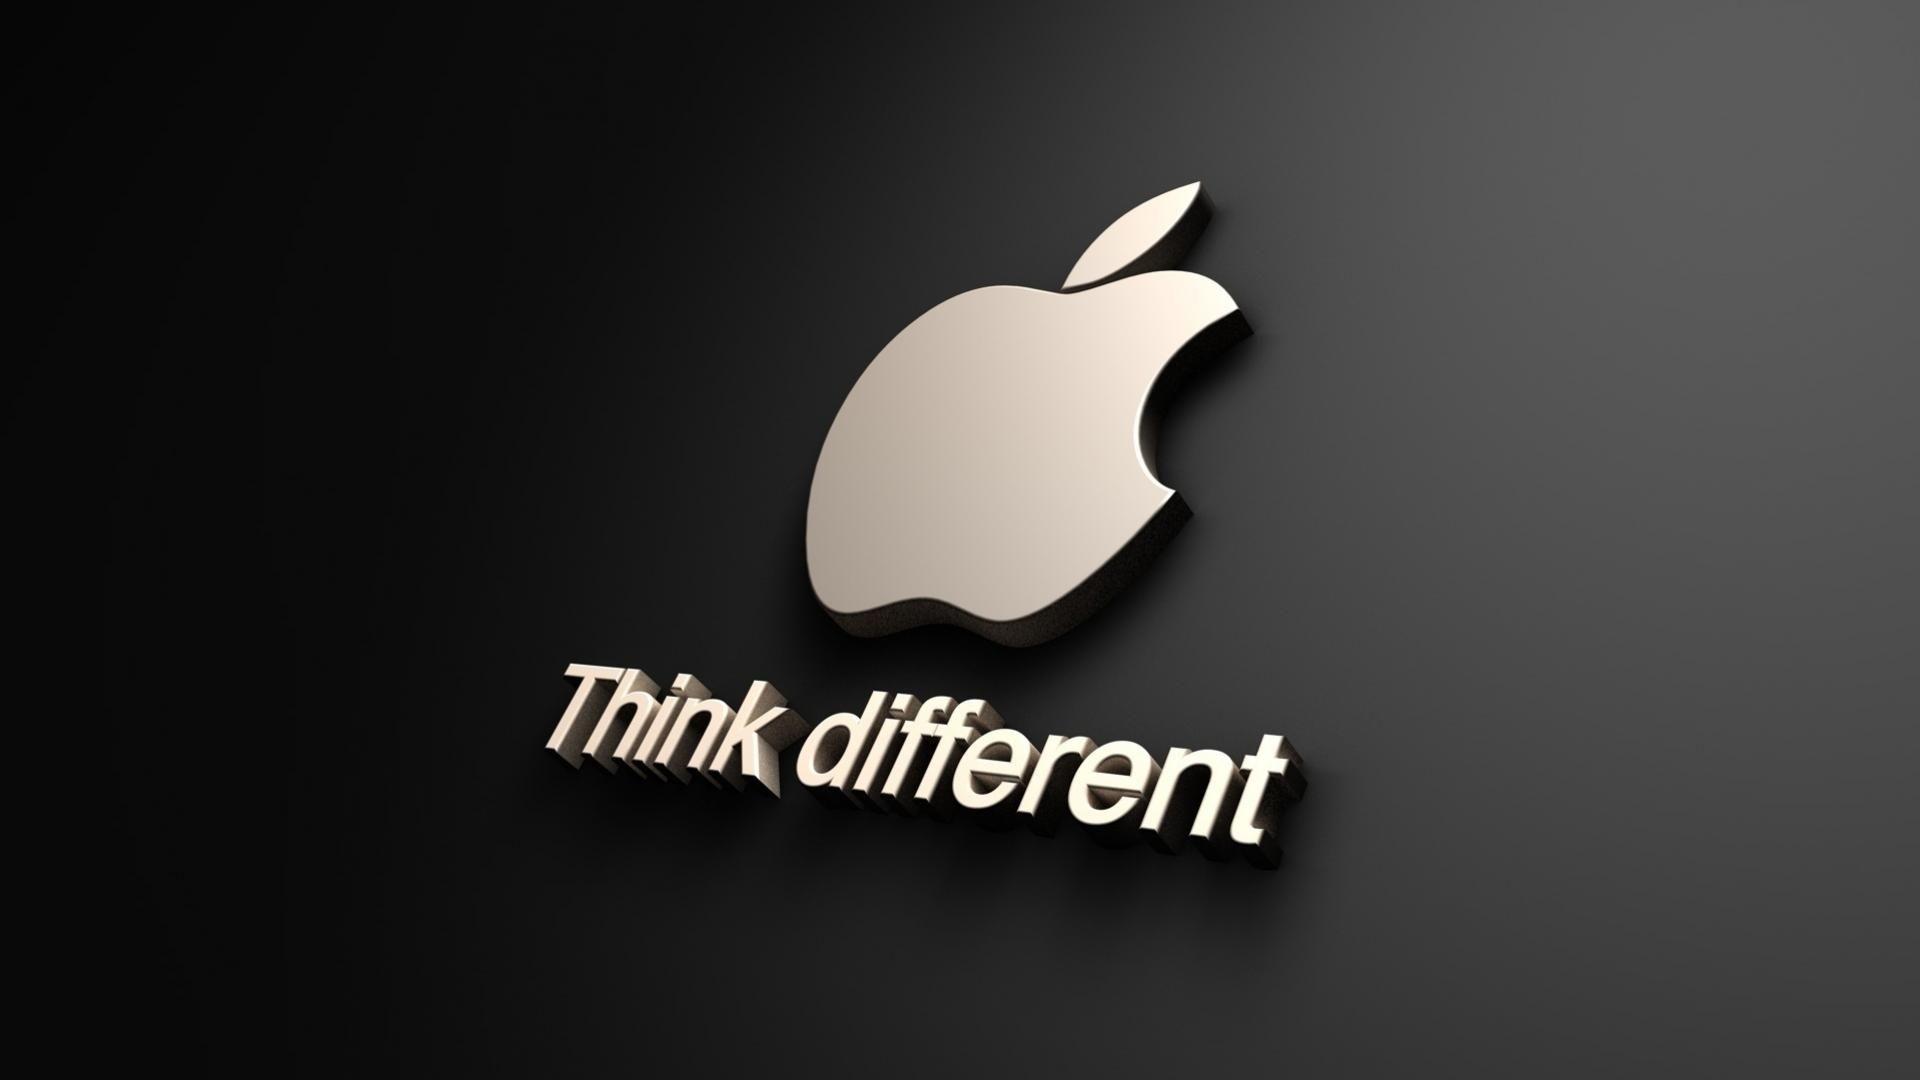 logo apple hd wallpaper | raj | pinterest | hd wallpaper, apple logo